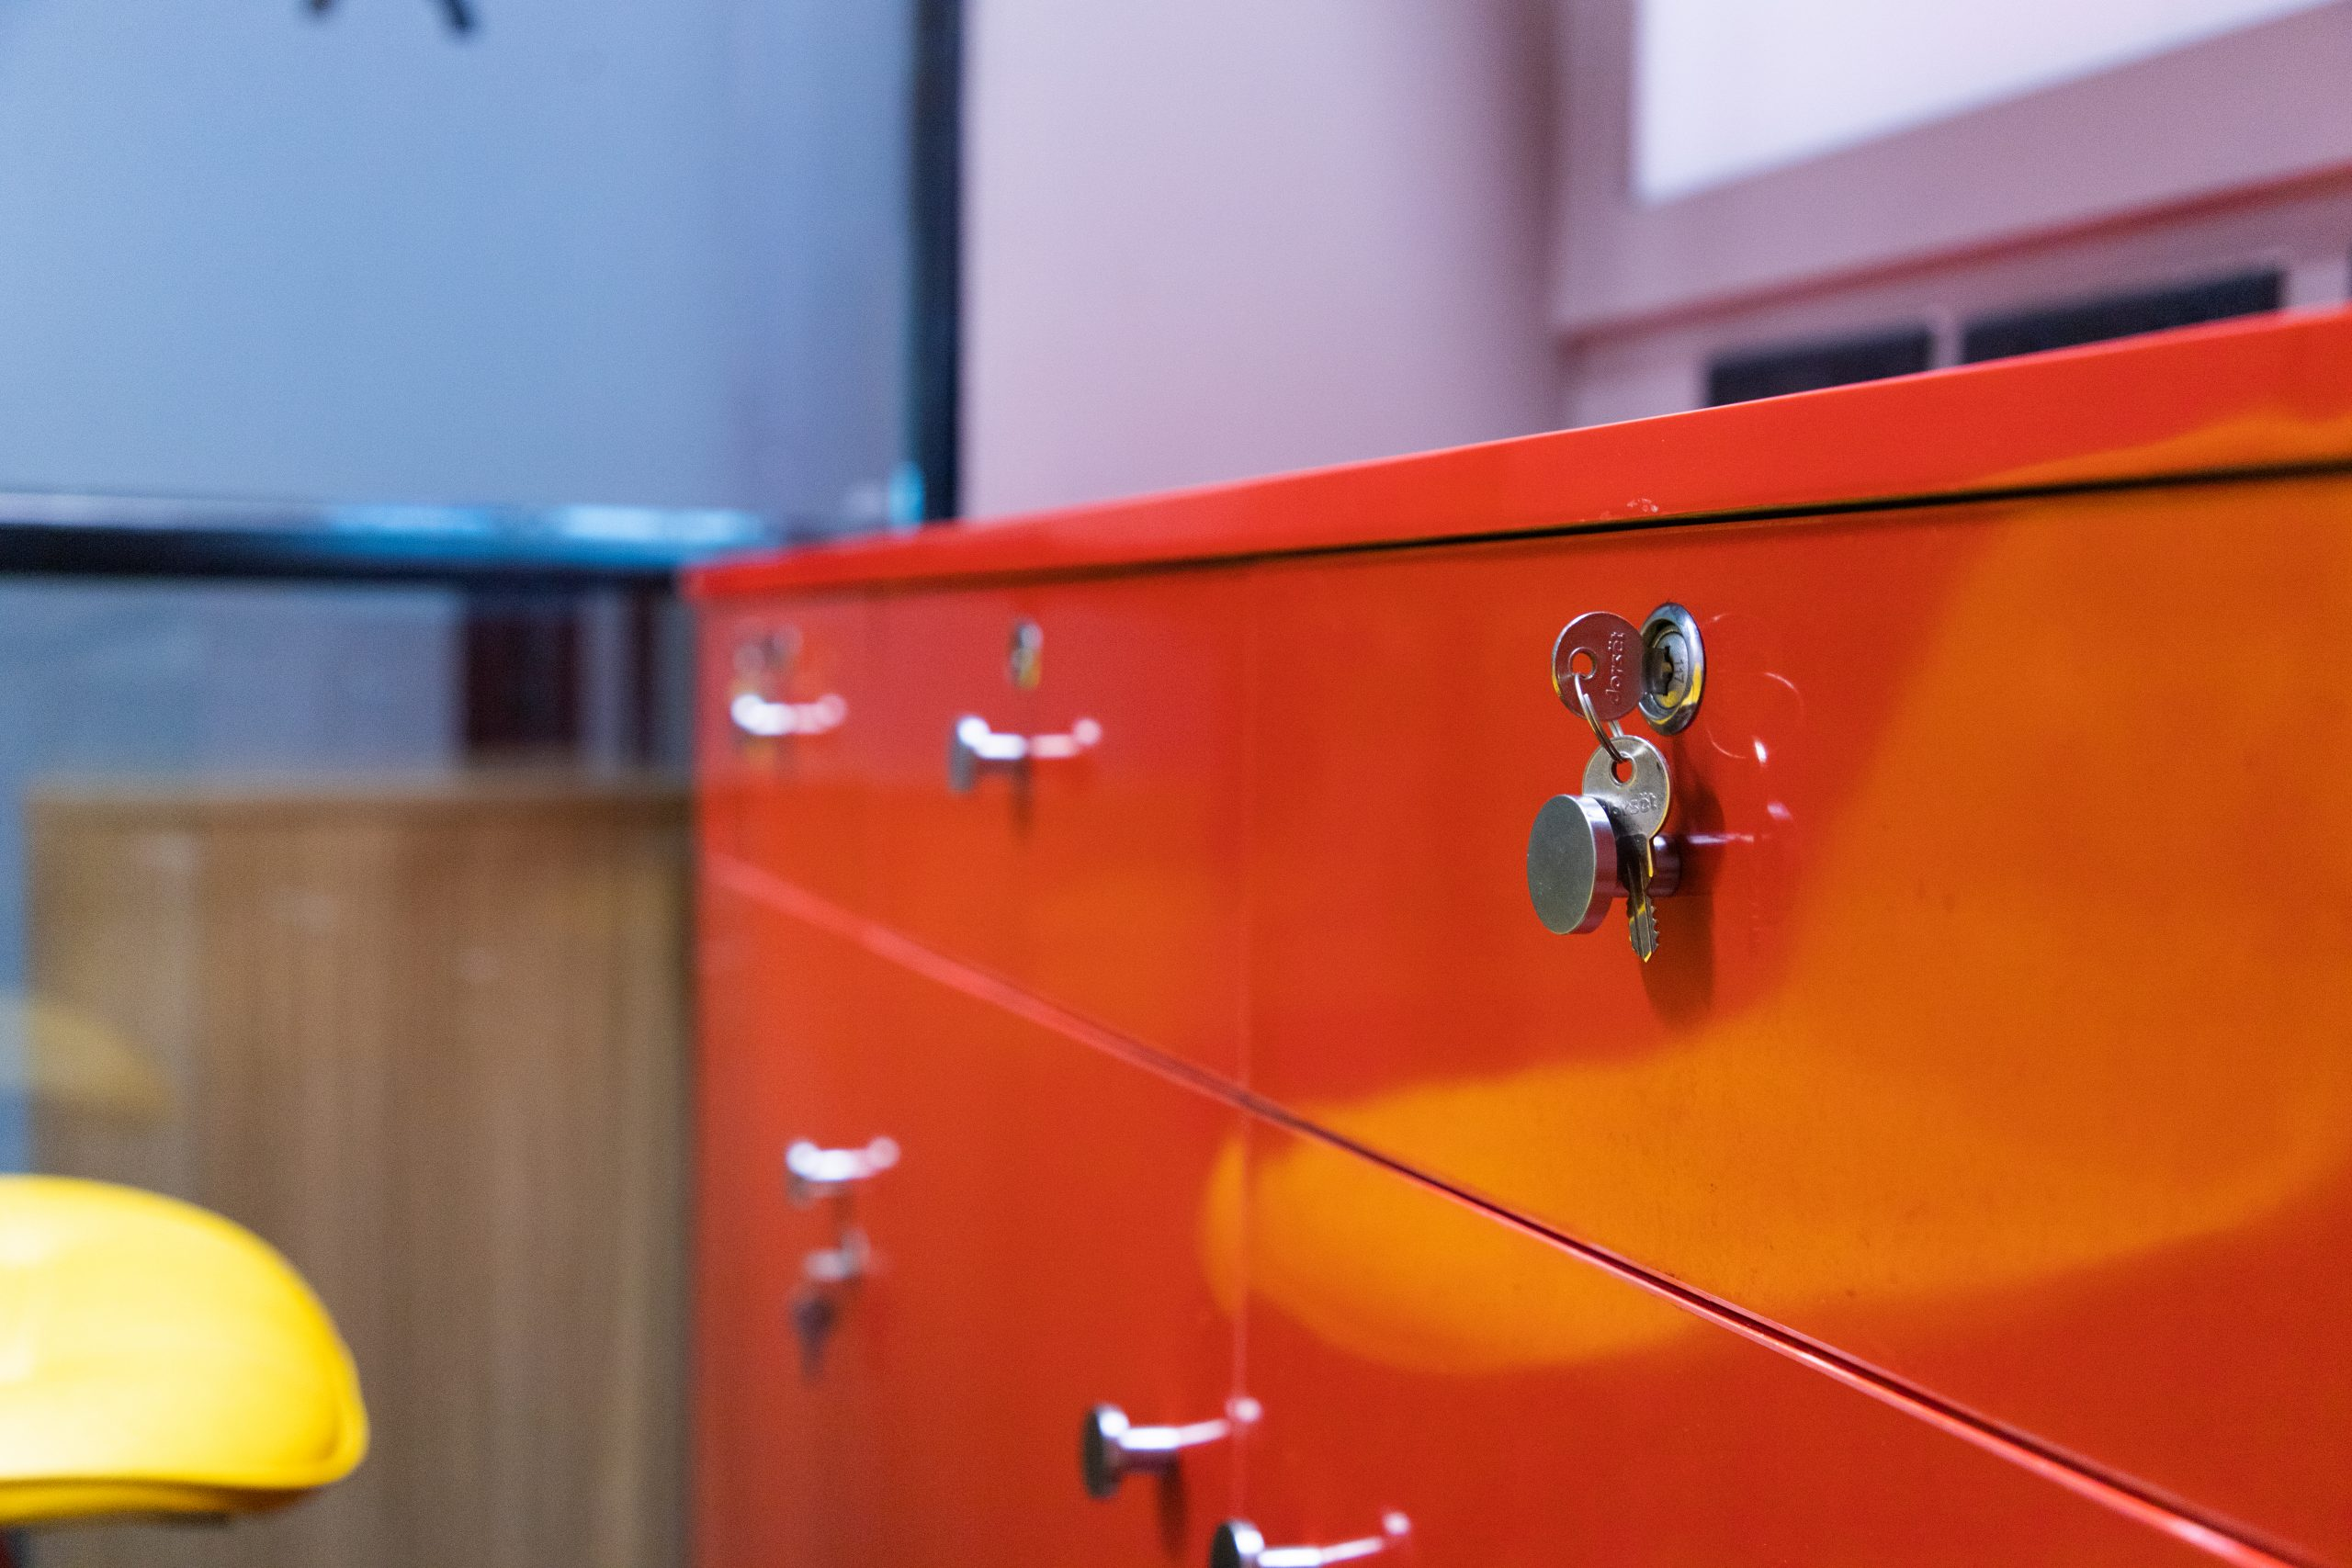 Red drawer